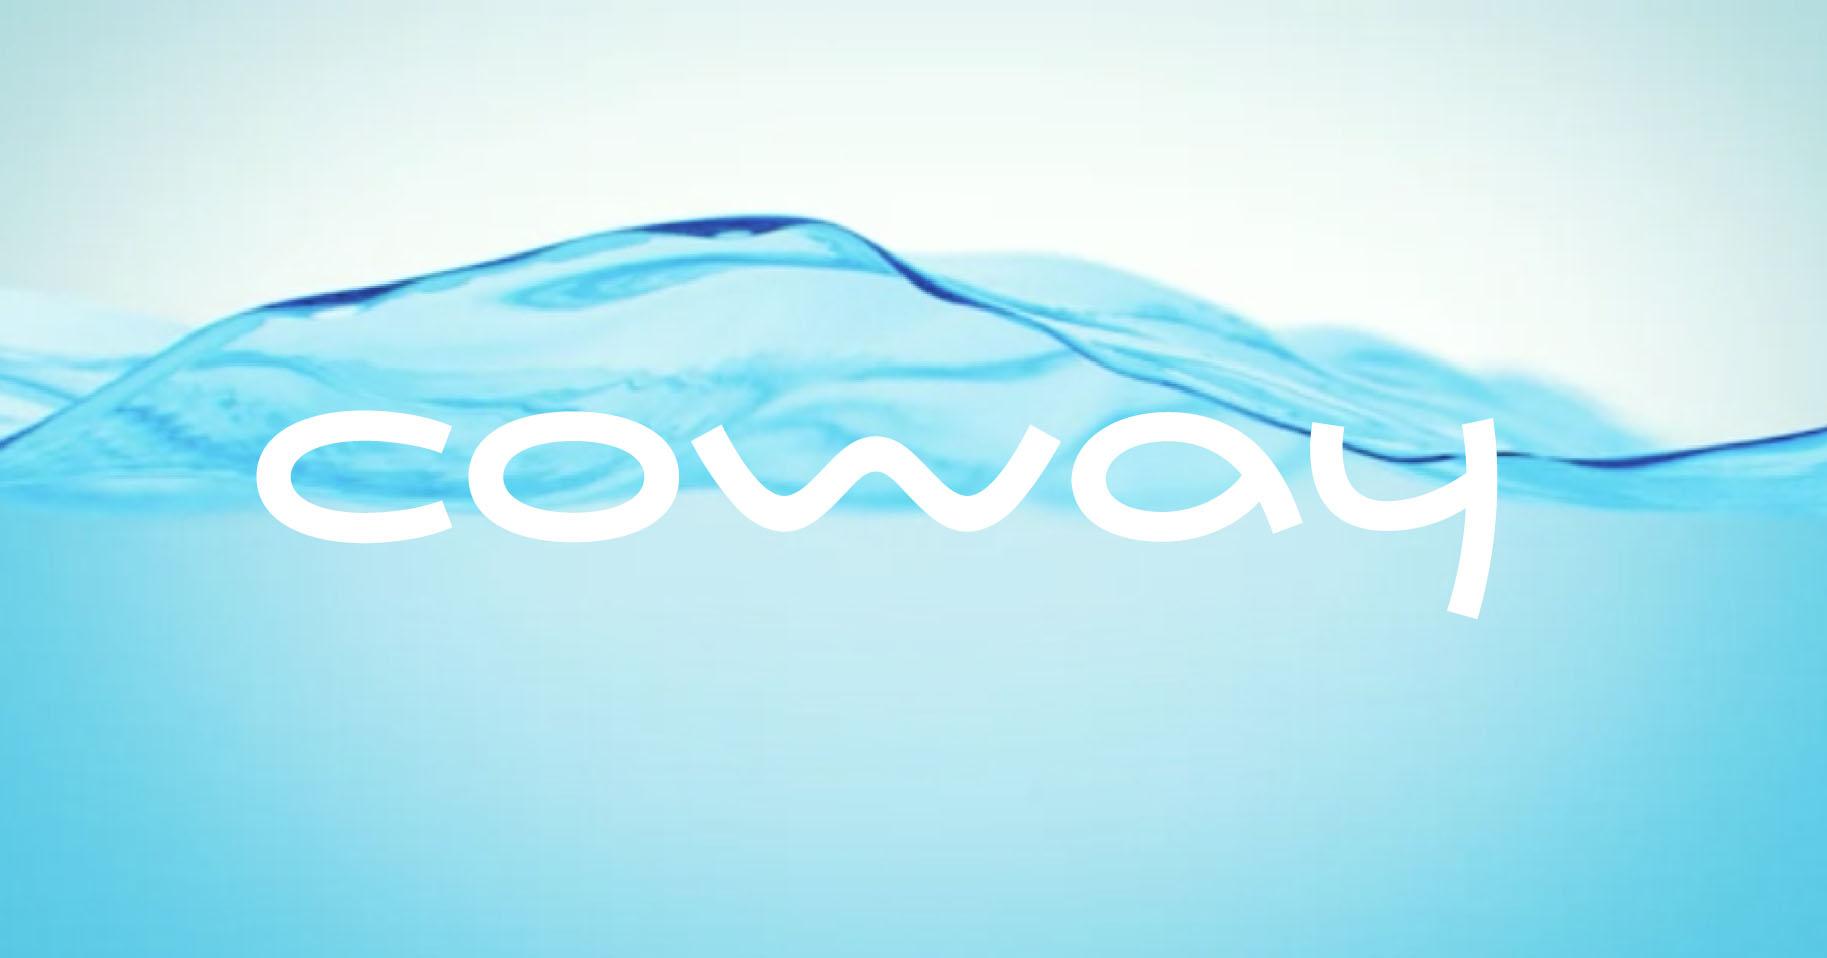 coway01.jpg